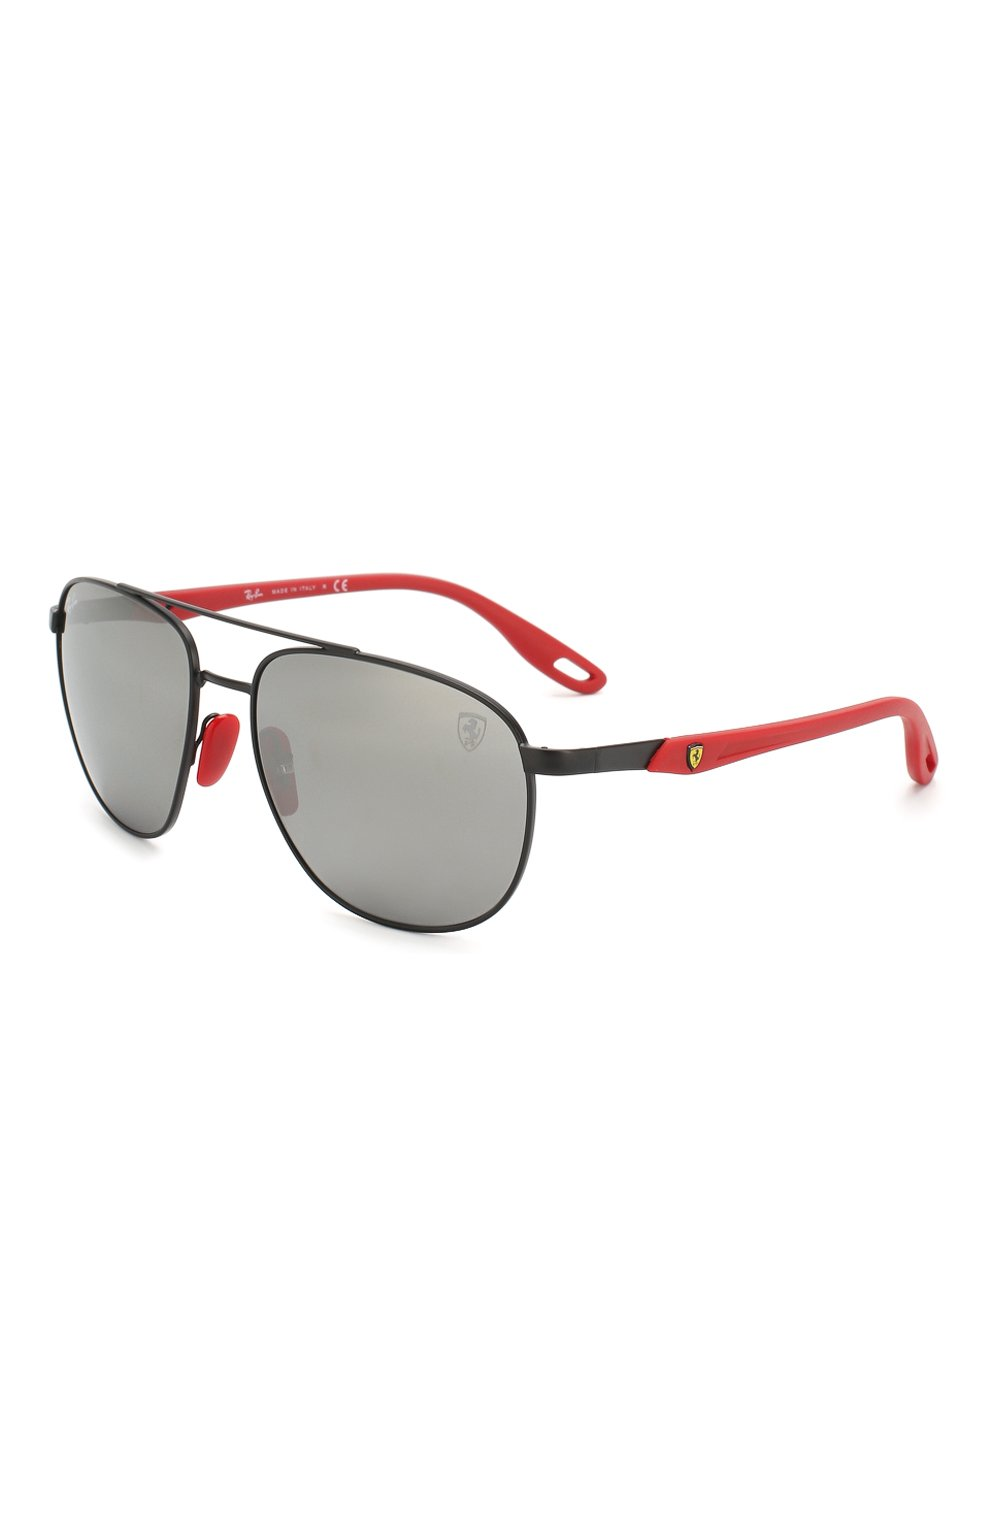 Мужские солнцезащитные очки RAY-BAN черного цвета, арт. 3659M-F0026G   Фото 1